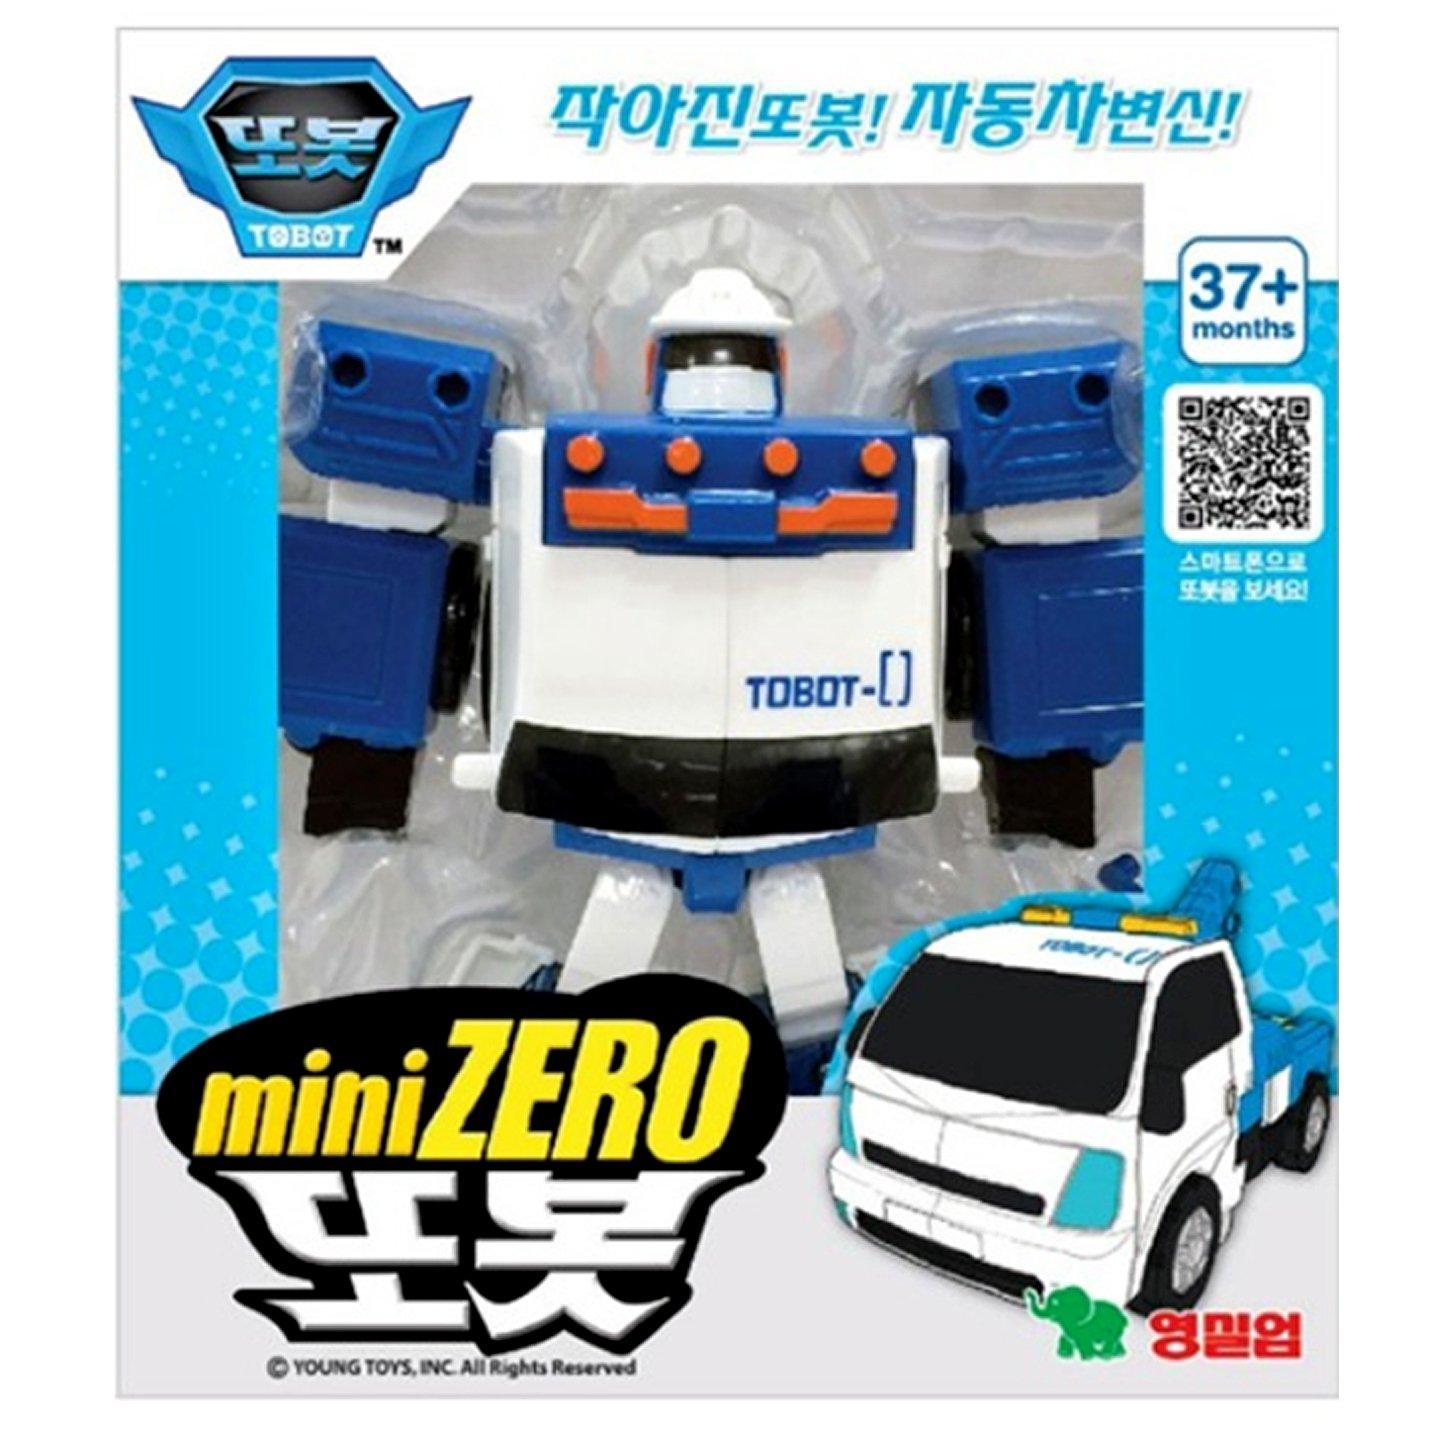 alta calidad Tobot ZERO Mini Transformer- Transformer- Transformer- Korean Animation Robot Character  con 60% de descuento